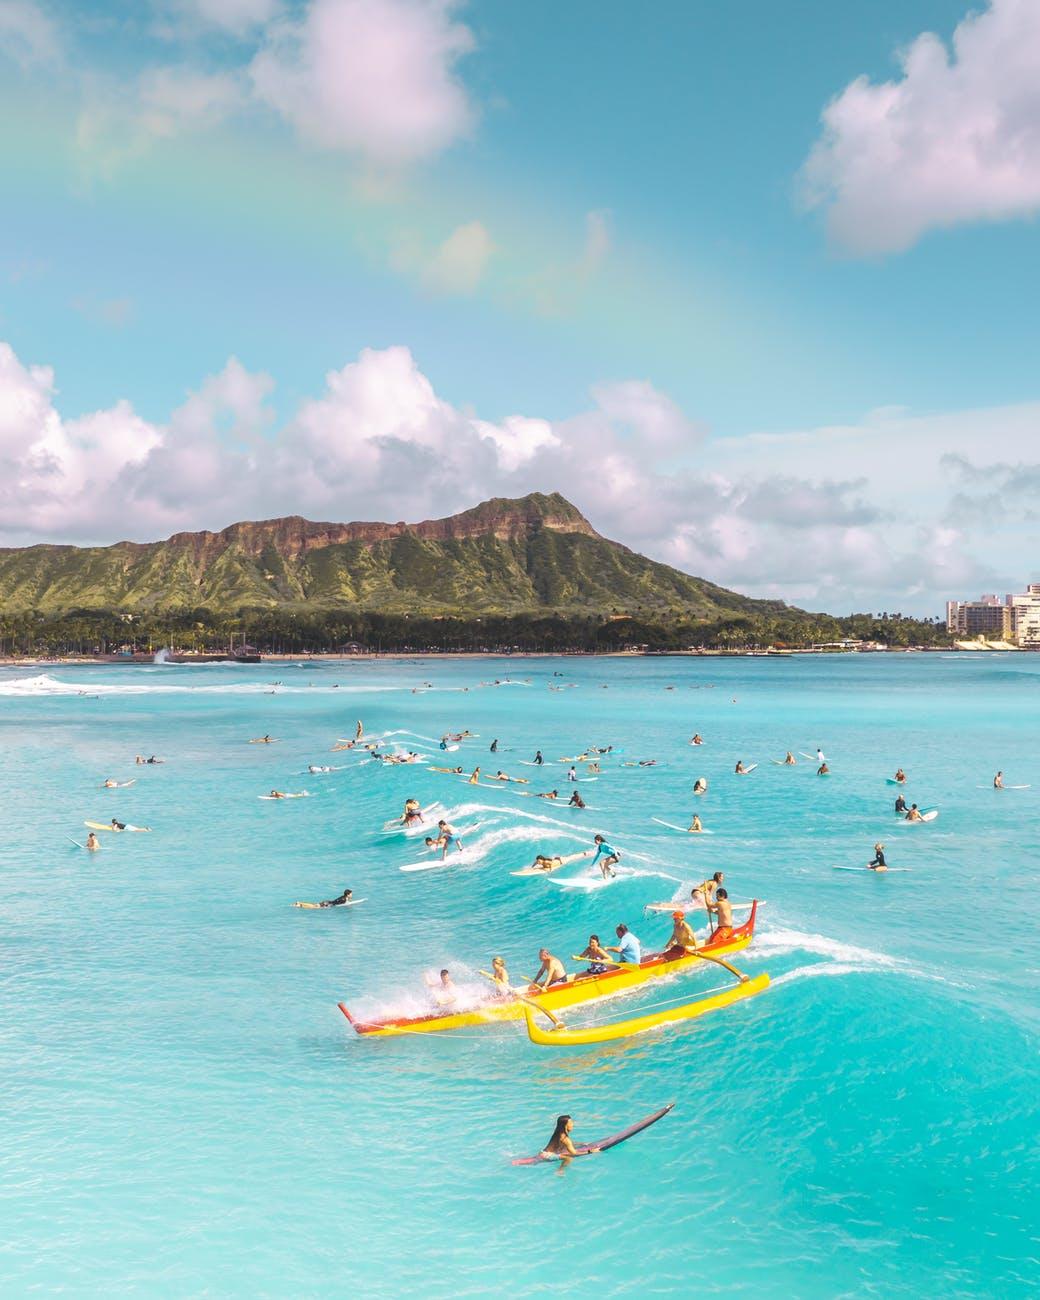 people riding yellow kayak on sea